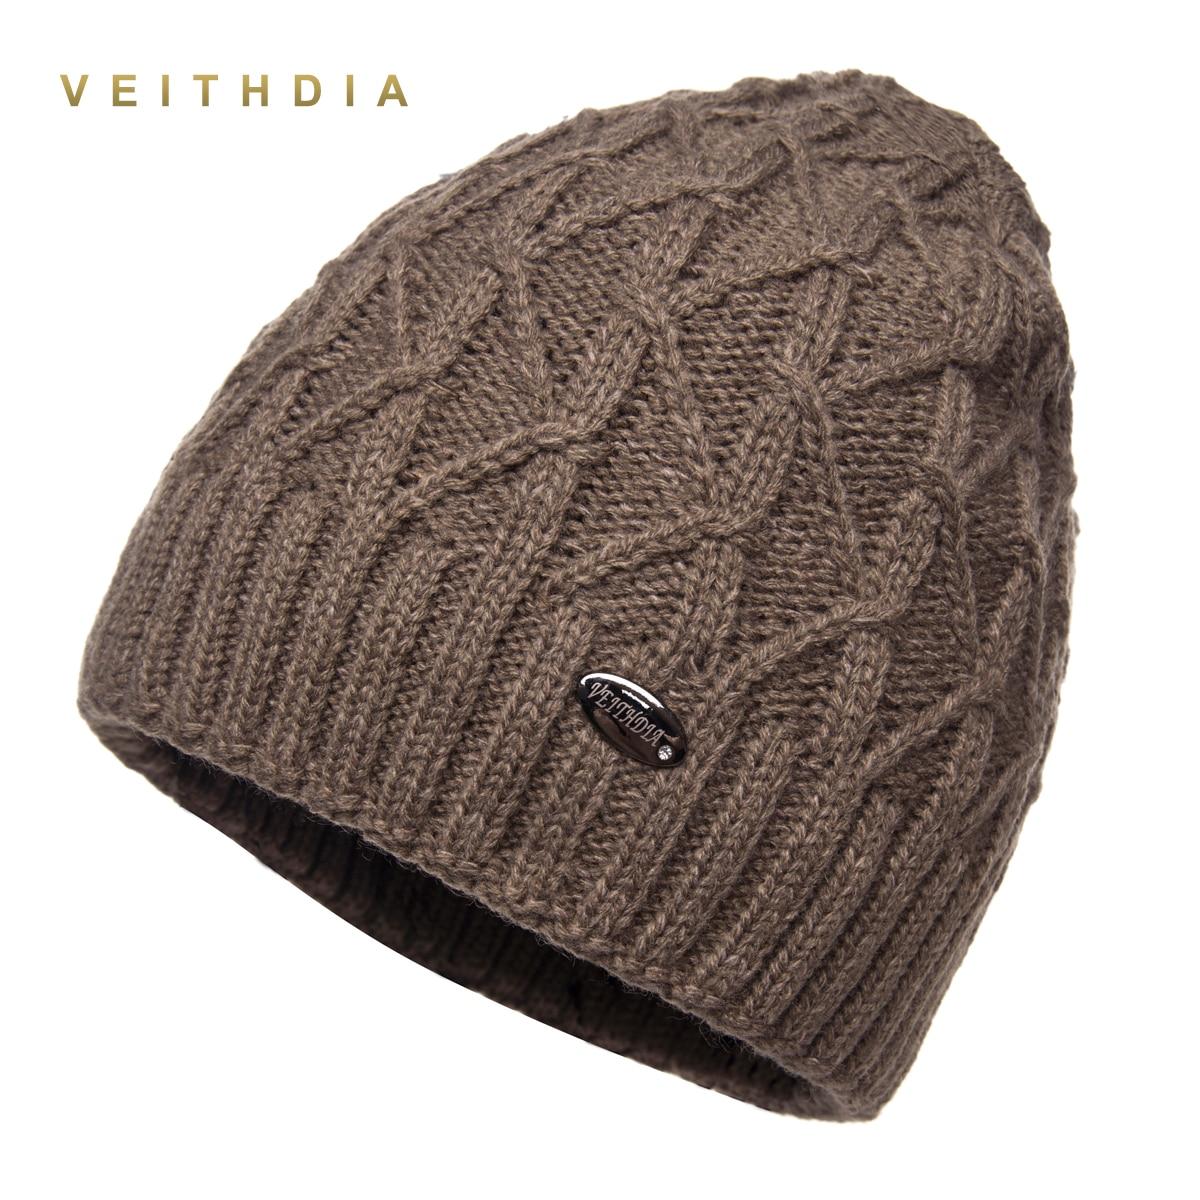 VEITHDIA winter hats for men   skullies   double layer gorro men's knitted wool   beanies   solid Color bonnet plus velvet warm cap man